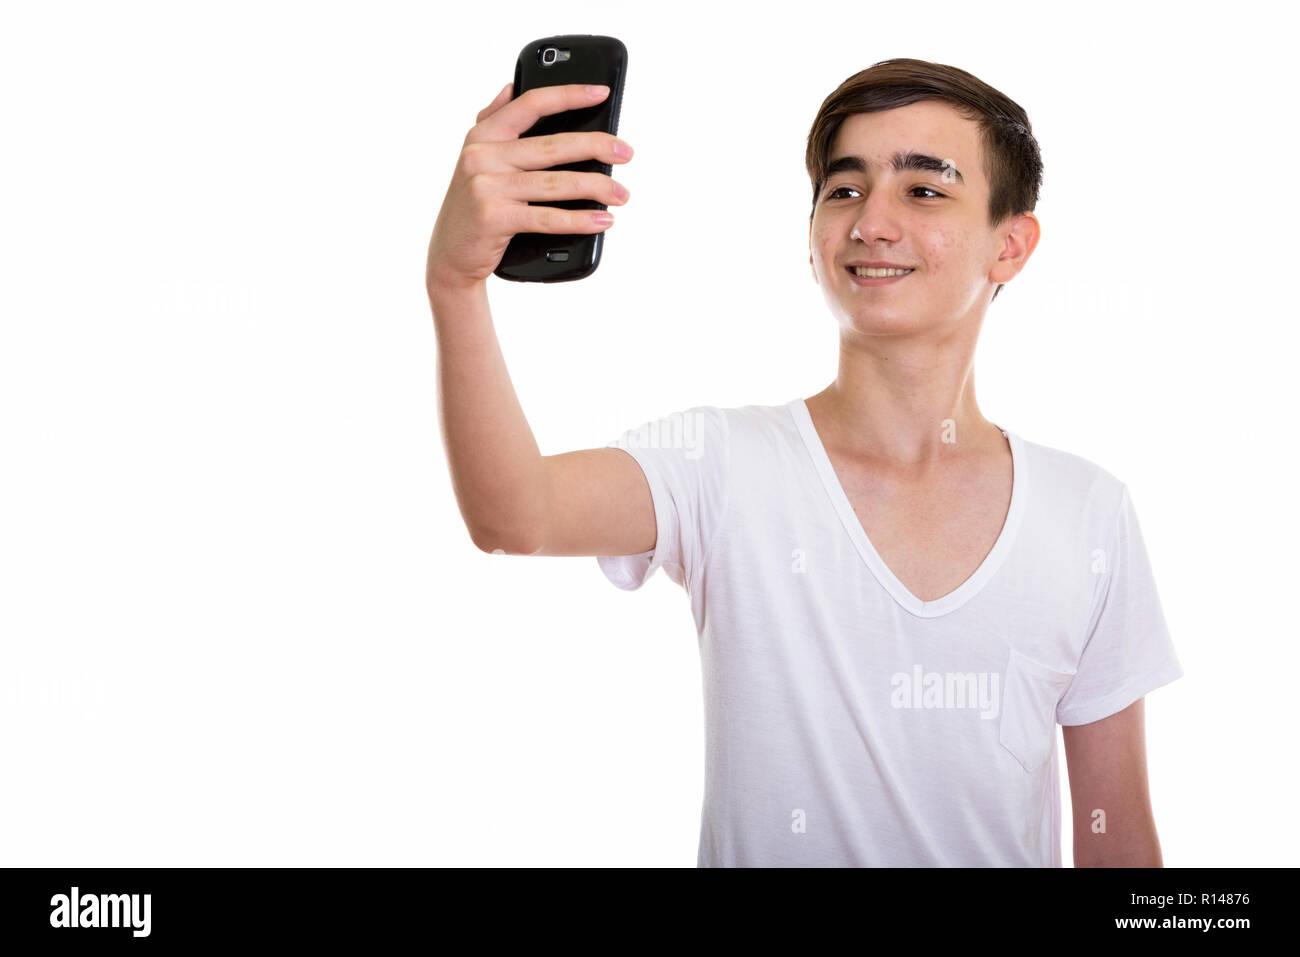 Blackfuckingwhiteboy Photos Of Young Teenagers Boy Self Shot